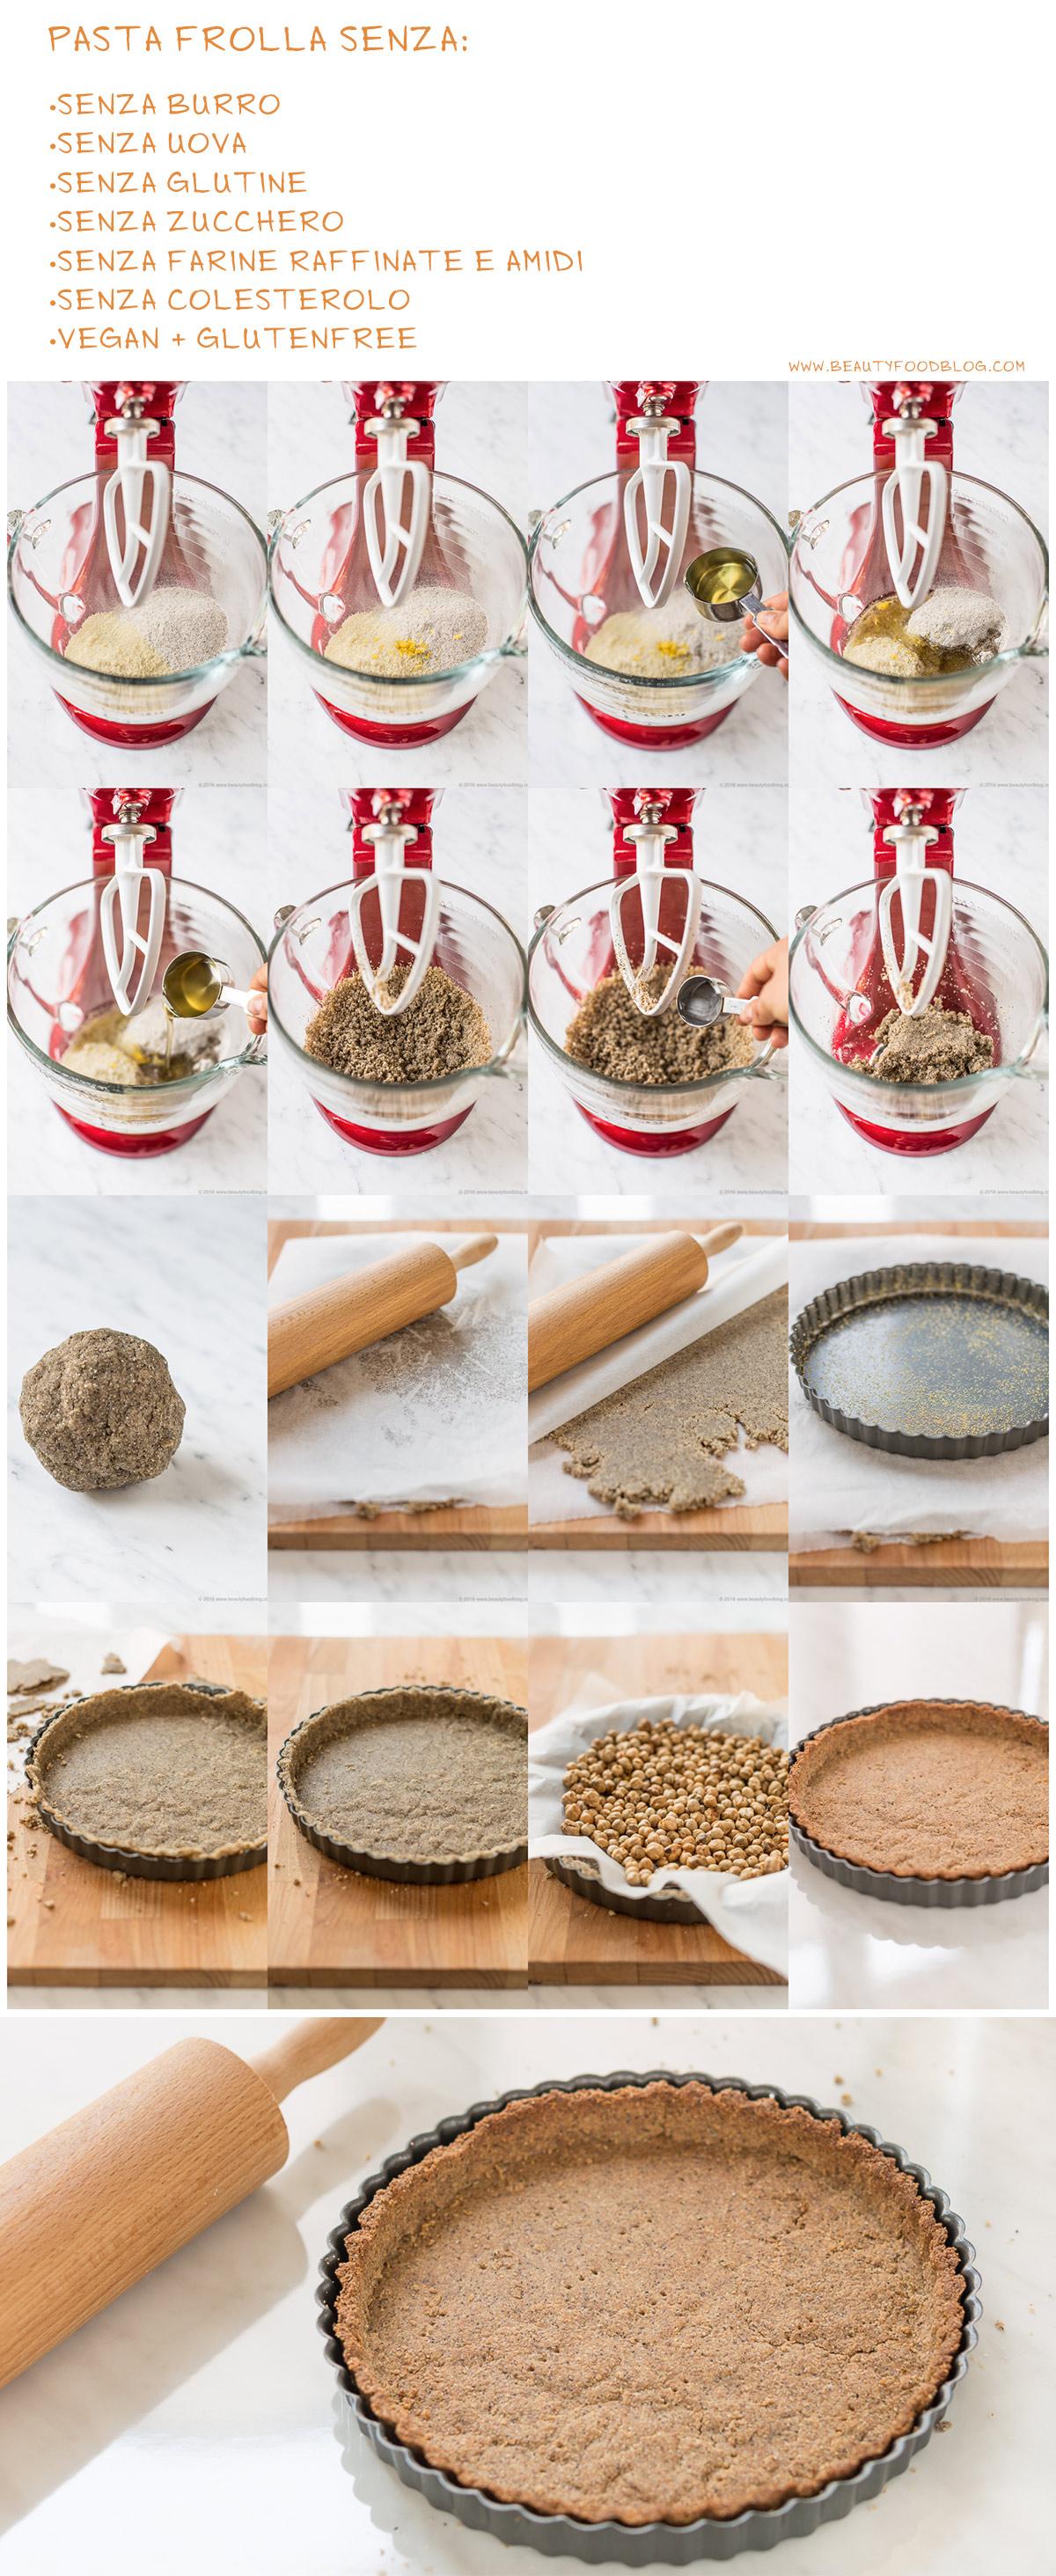 ricetta pasta frolla senza burro senza uova senza glutine senza zucchero vegan - how to make vegan glutenfree sugarfree no butter no coconut oil tart crust